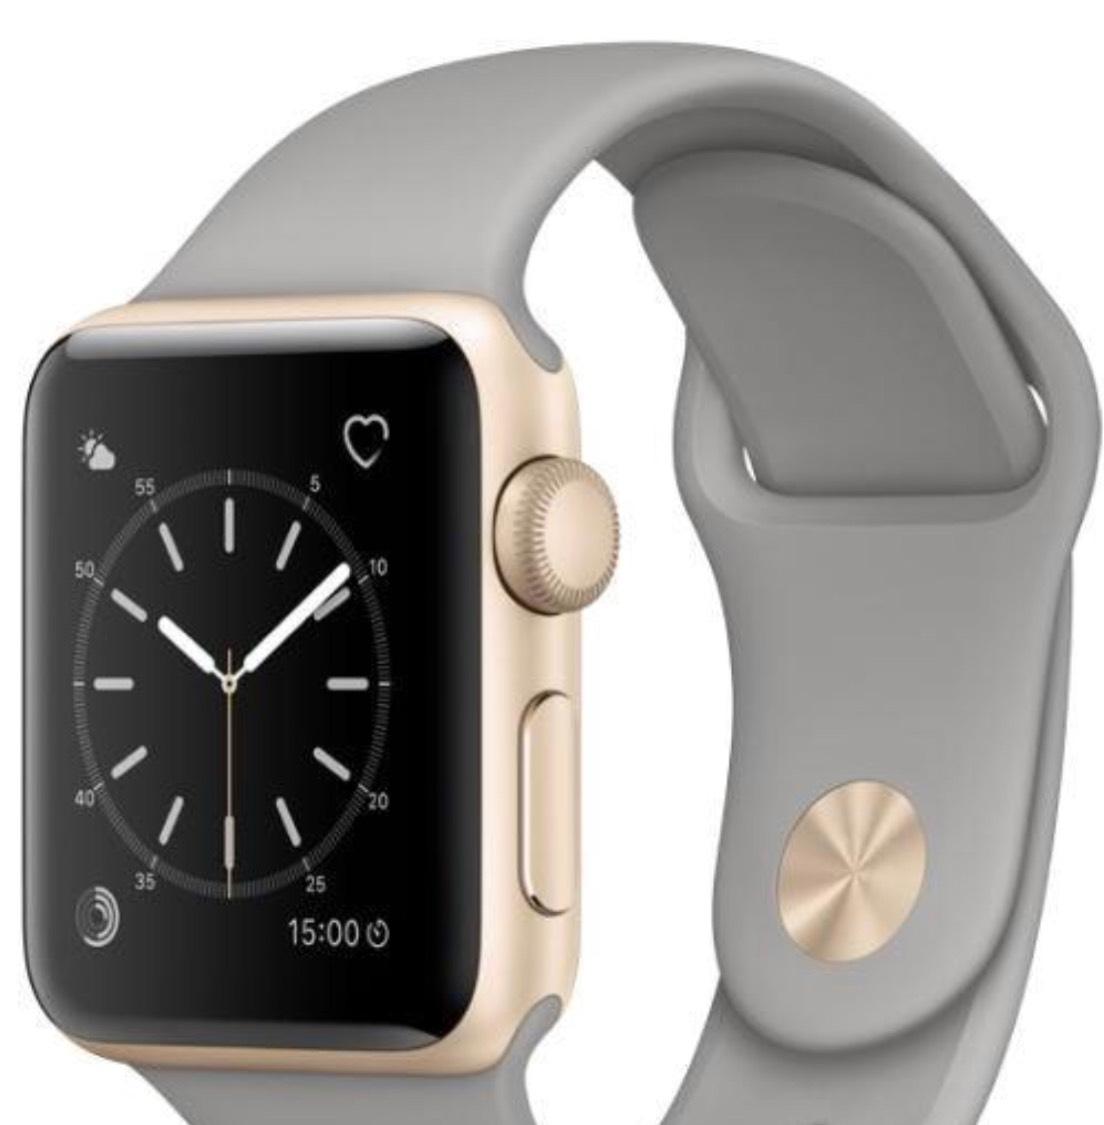 [Schweiz] Apple Watch Series 2 38mm